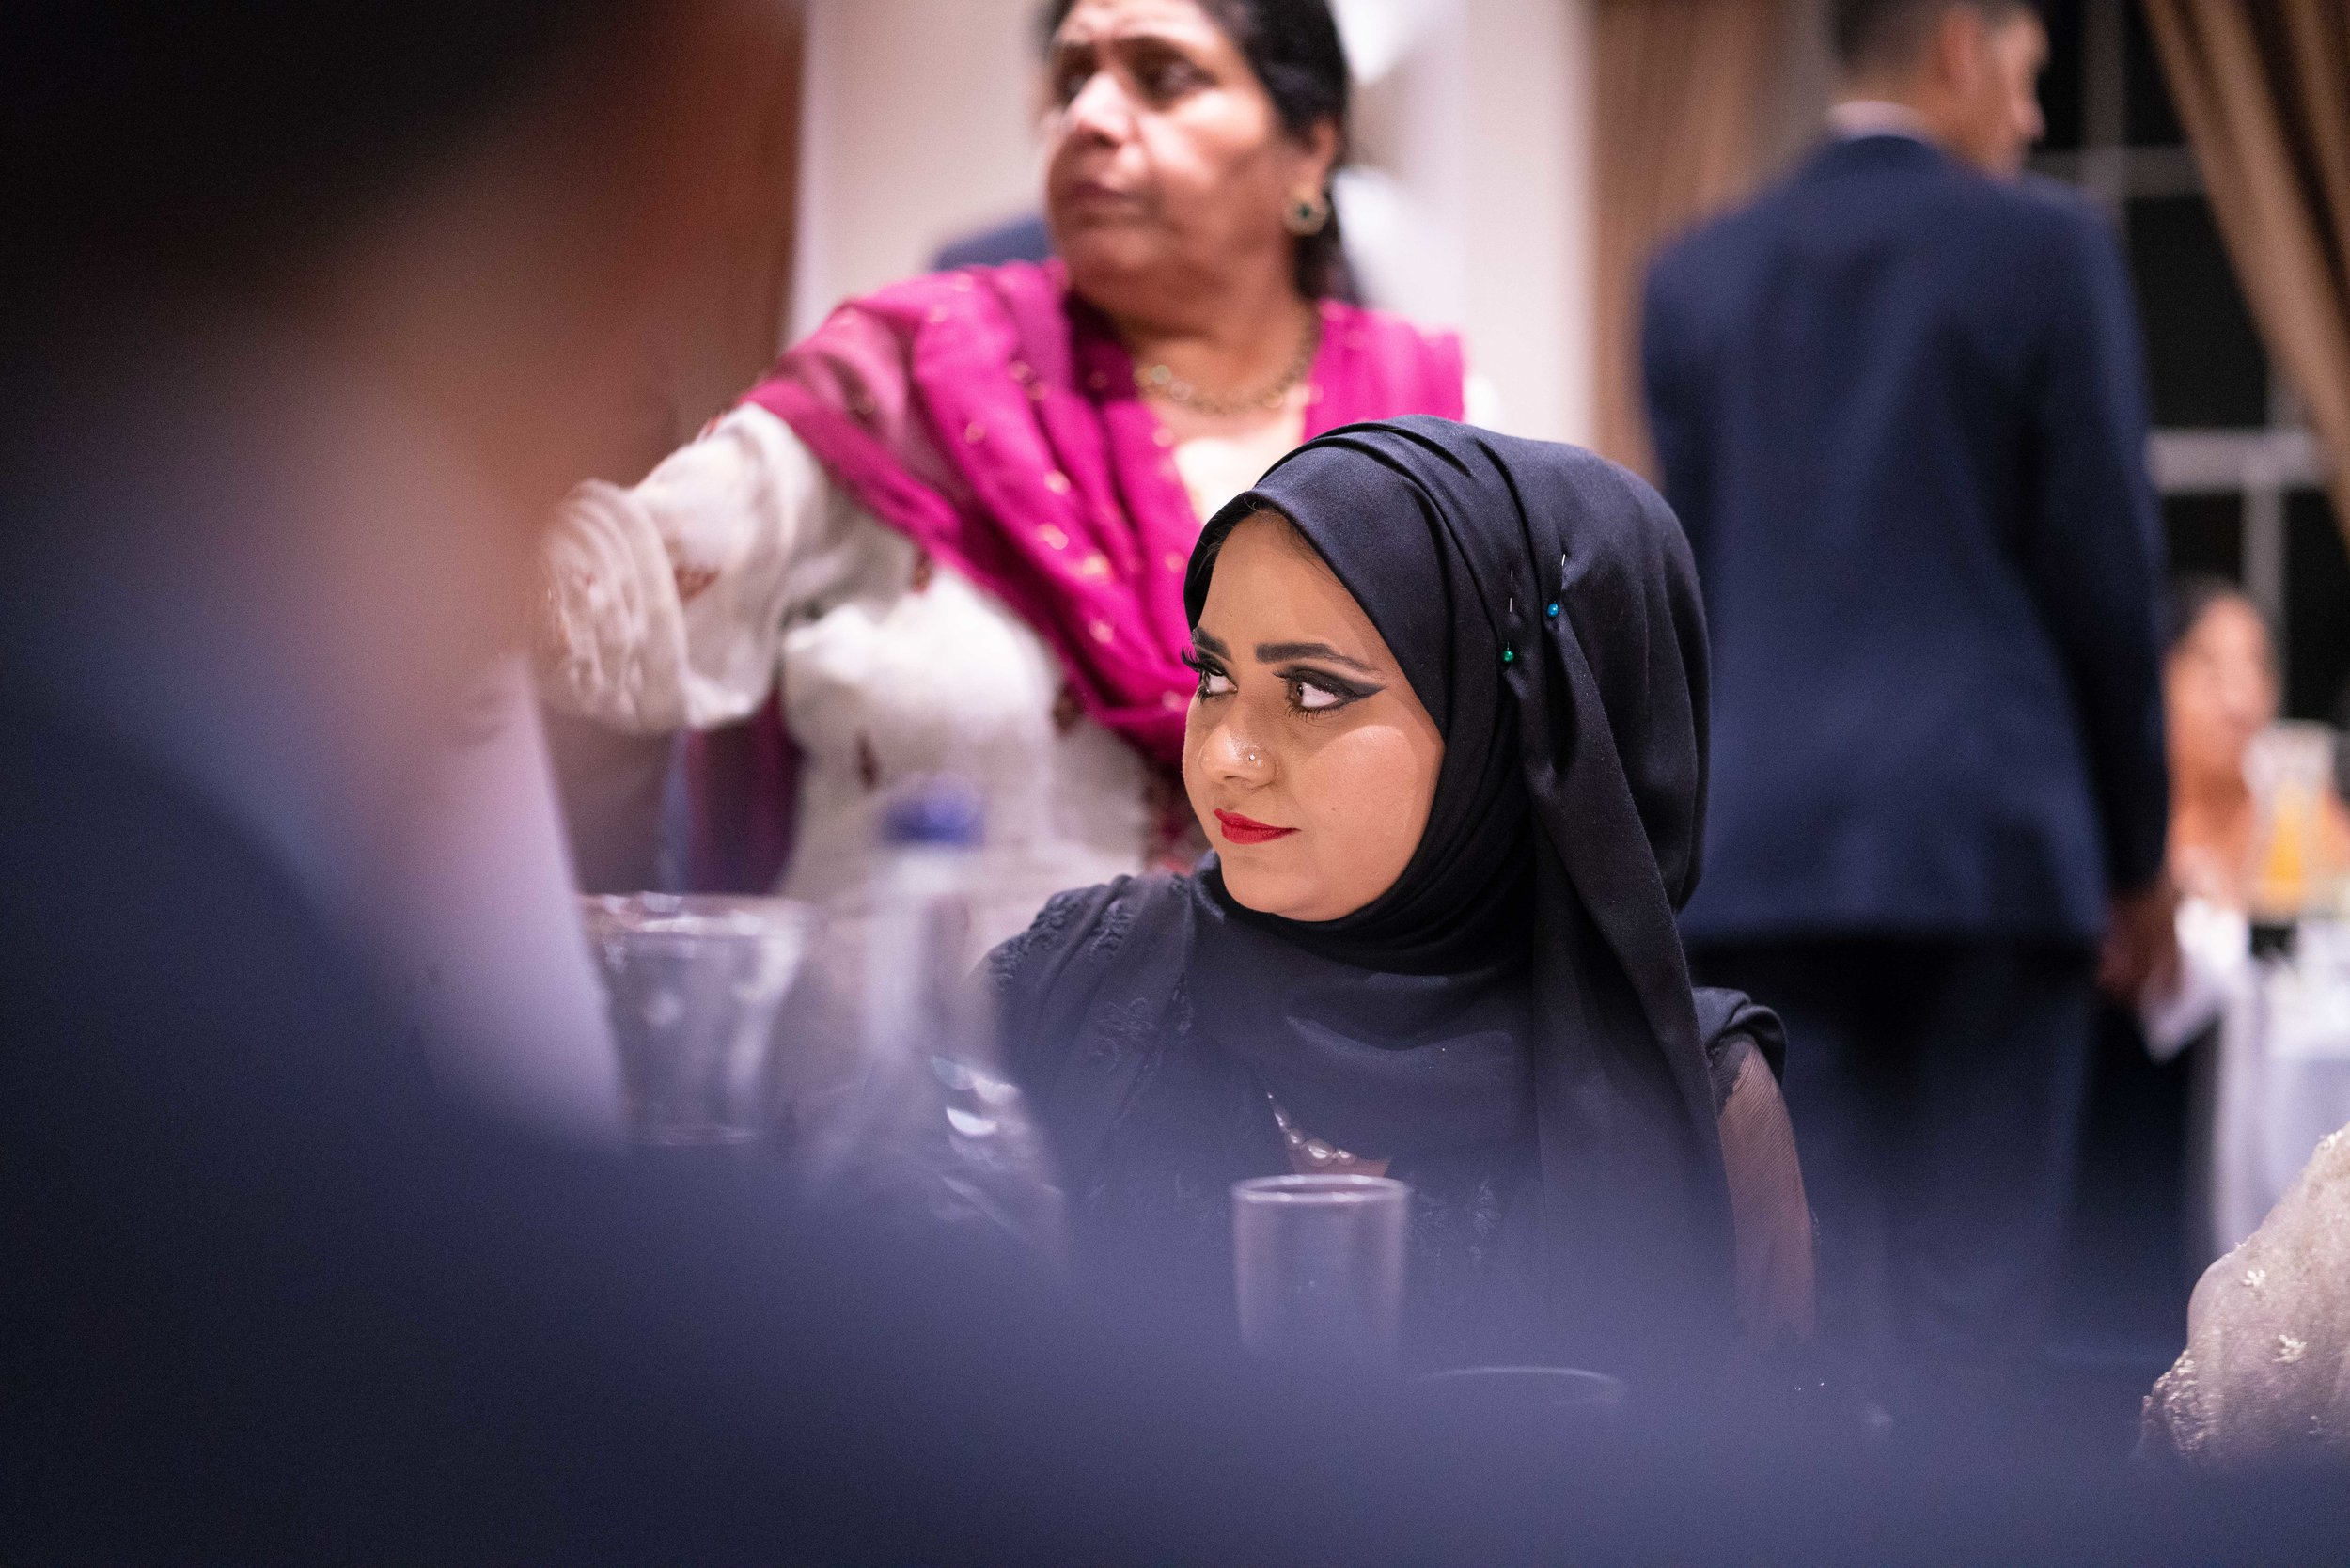 buckinghamshire-golf-club-winter-muslim-wedding-engagement-photography-videography-36